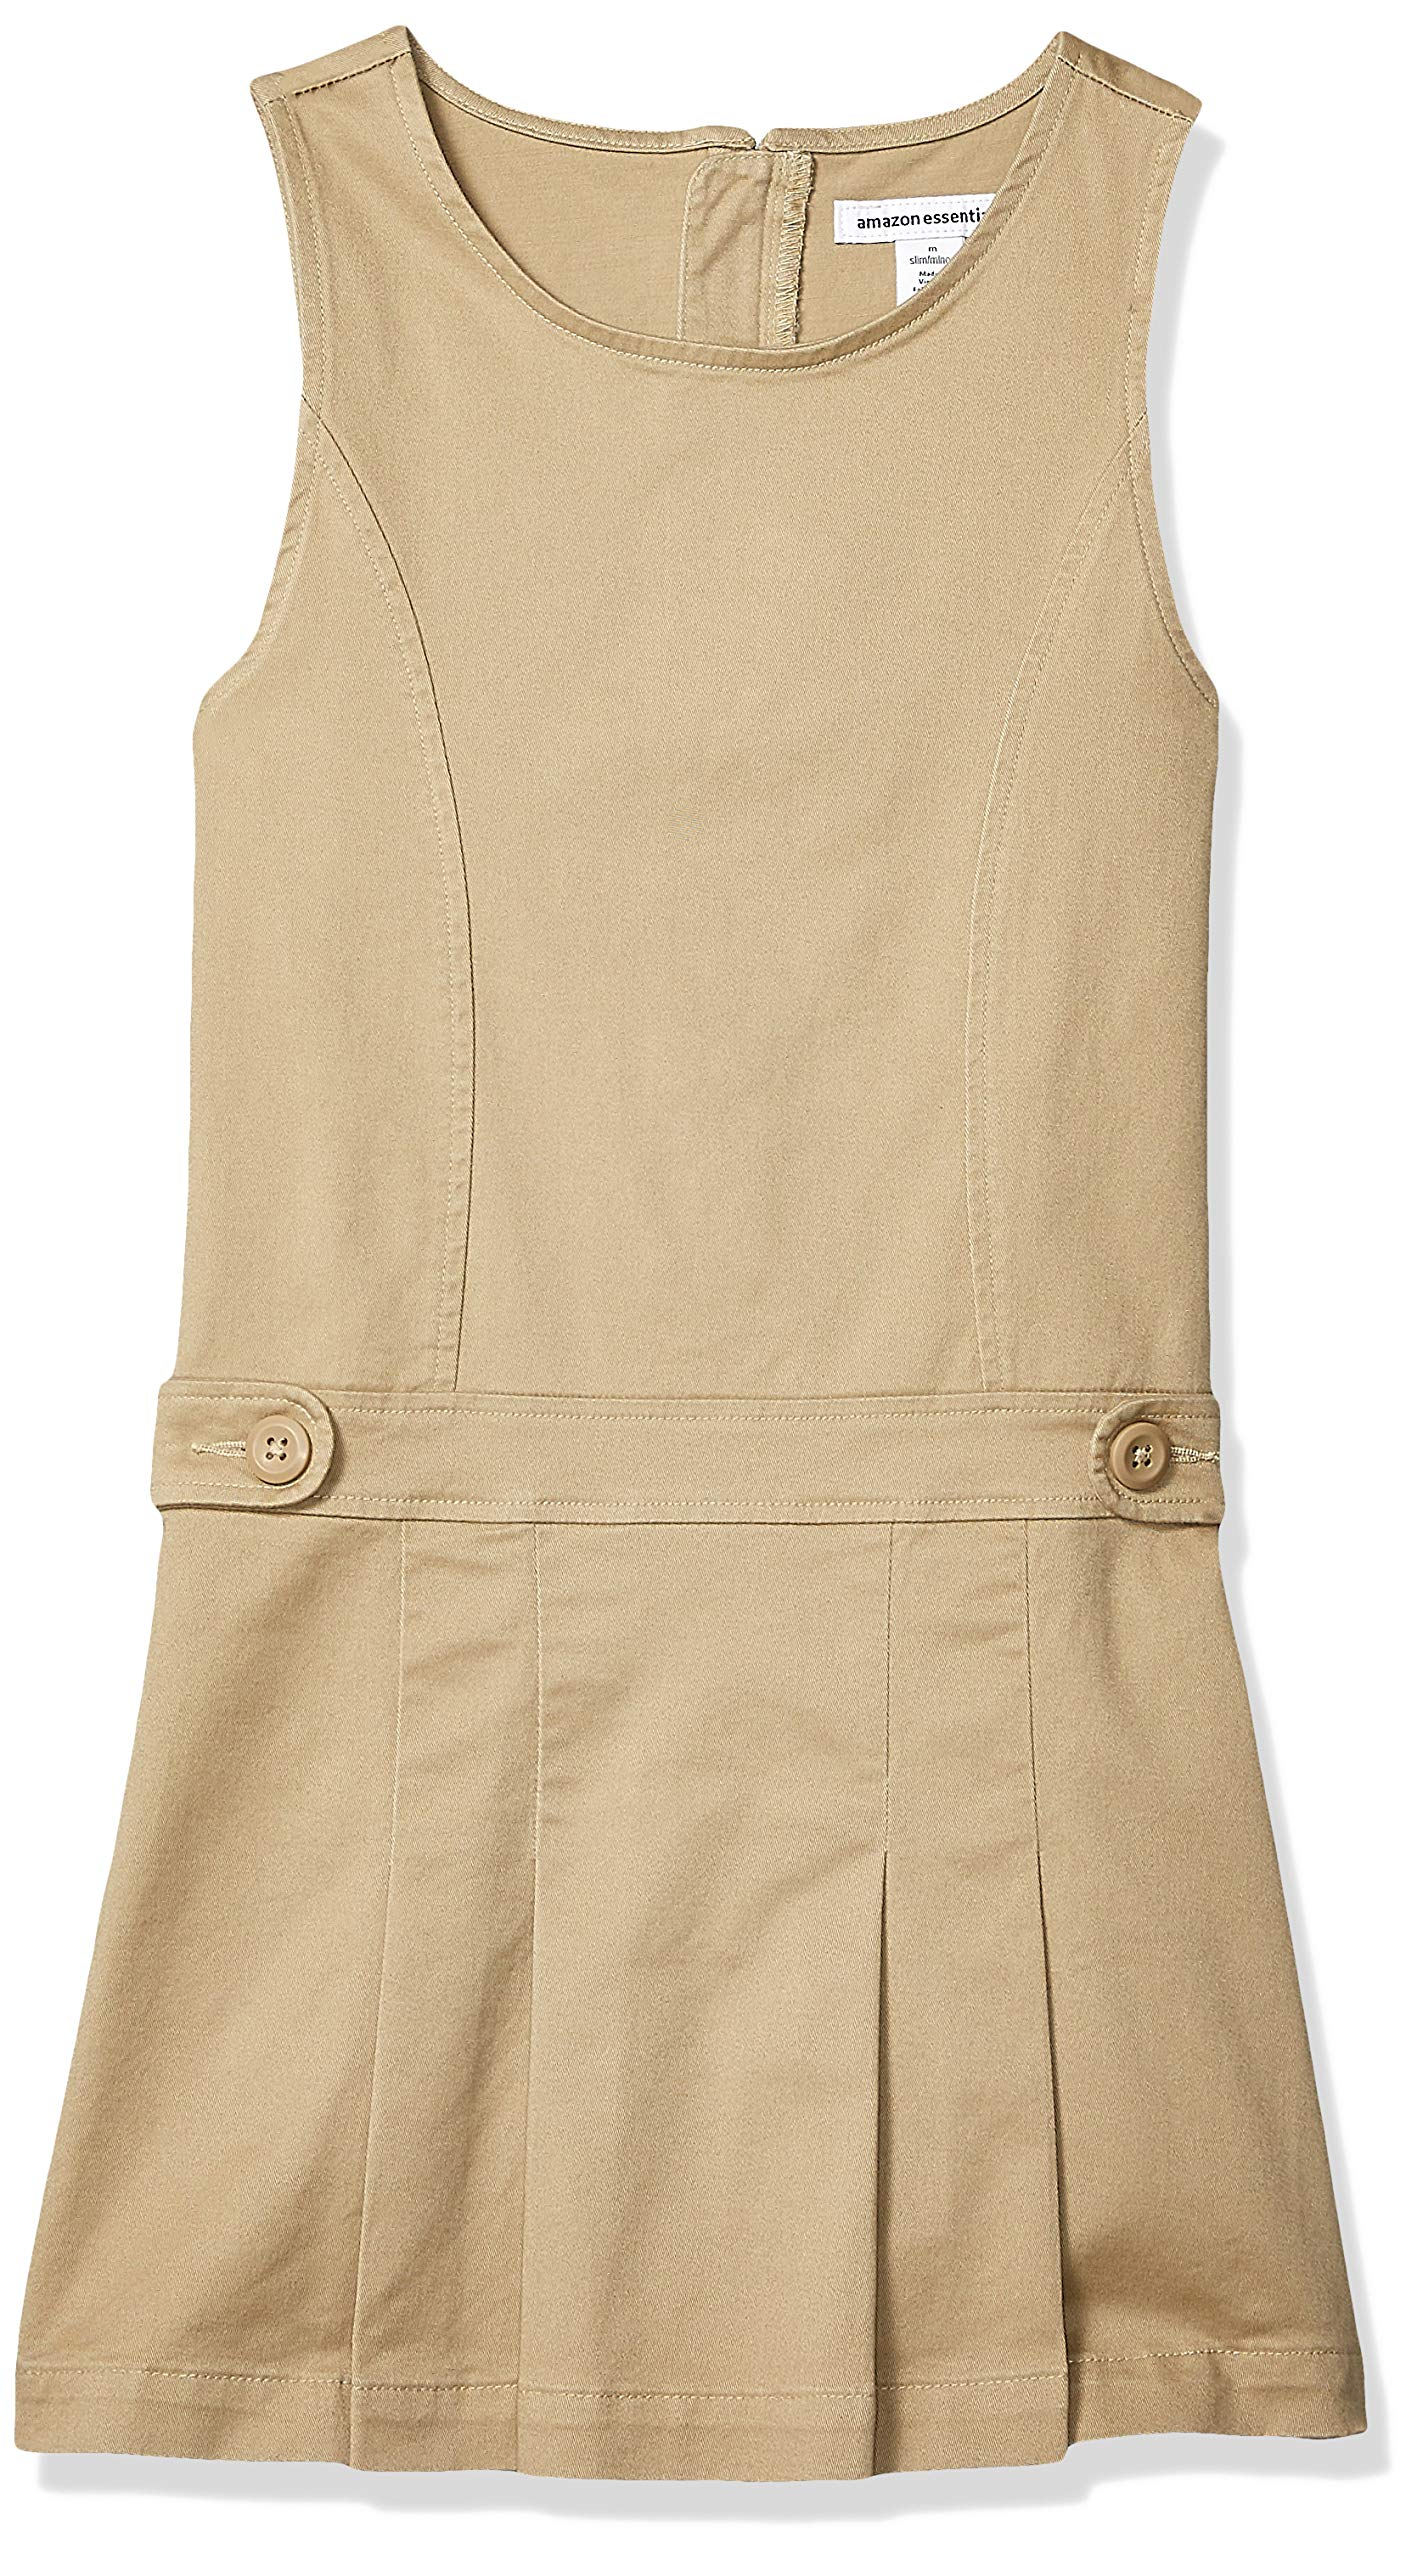 Amazon Essentials Girl's Uniform Jumper, Khaki, L(P) by Amazon Essentials